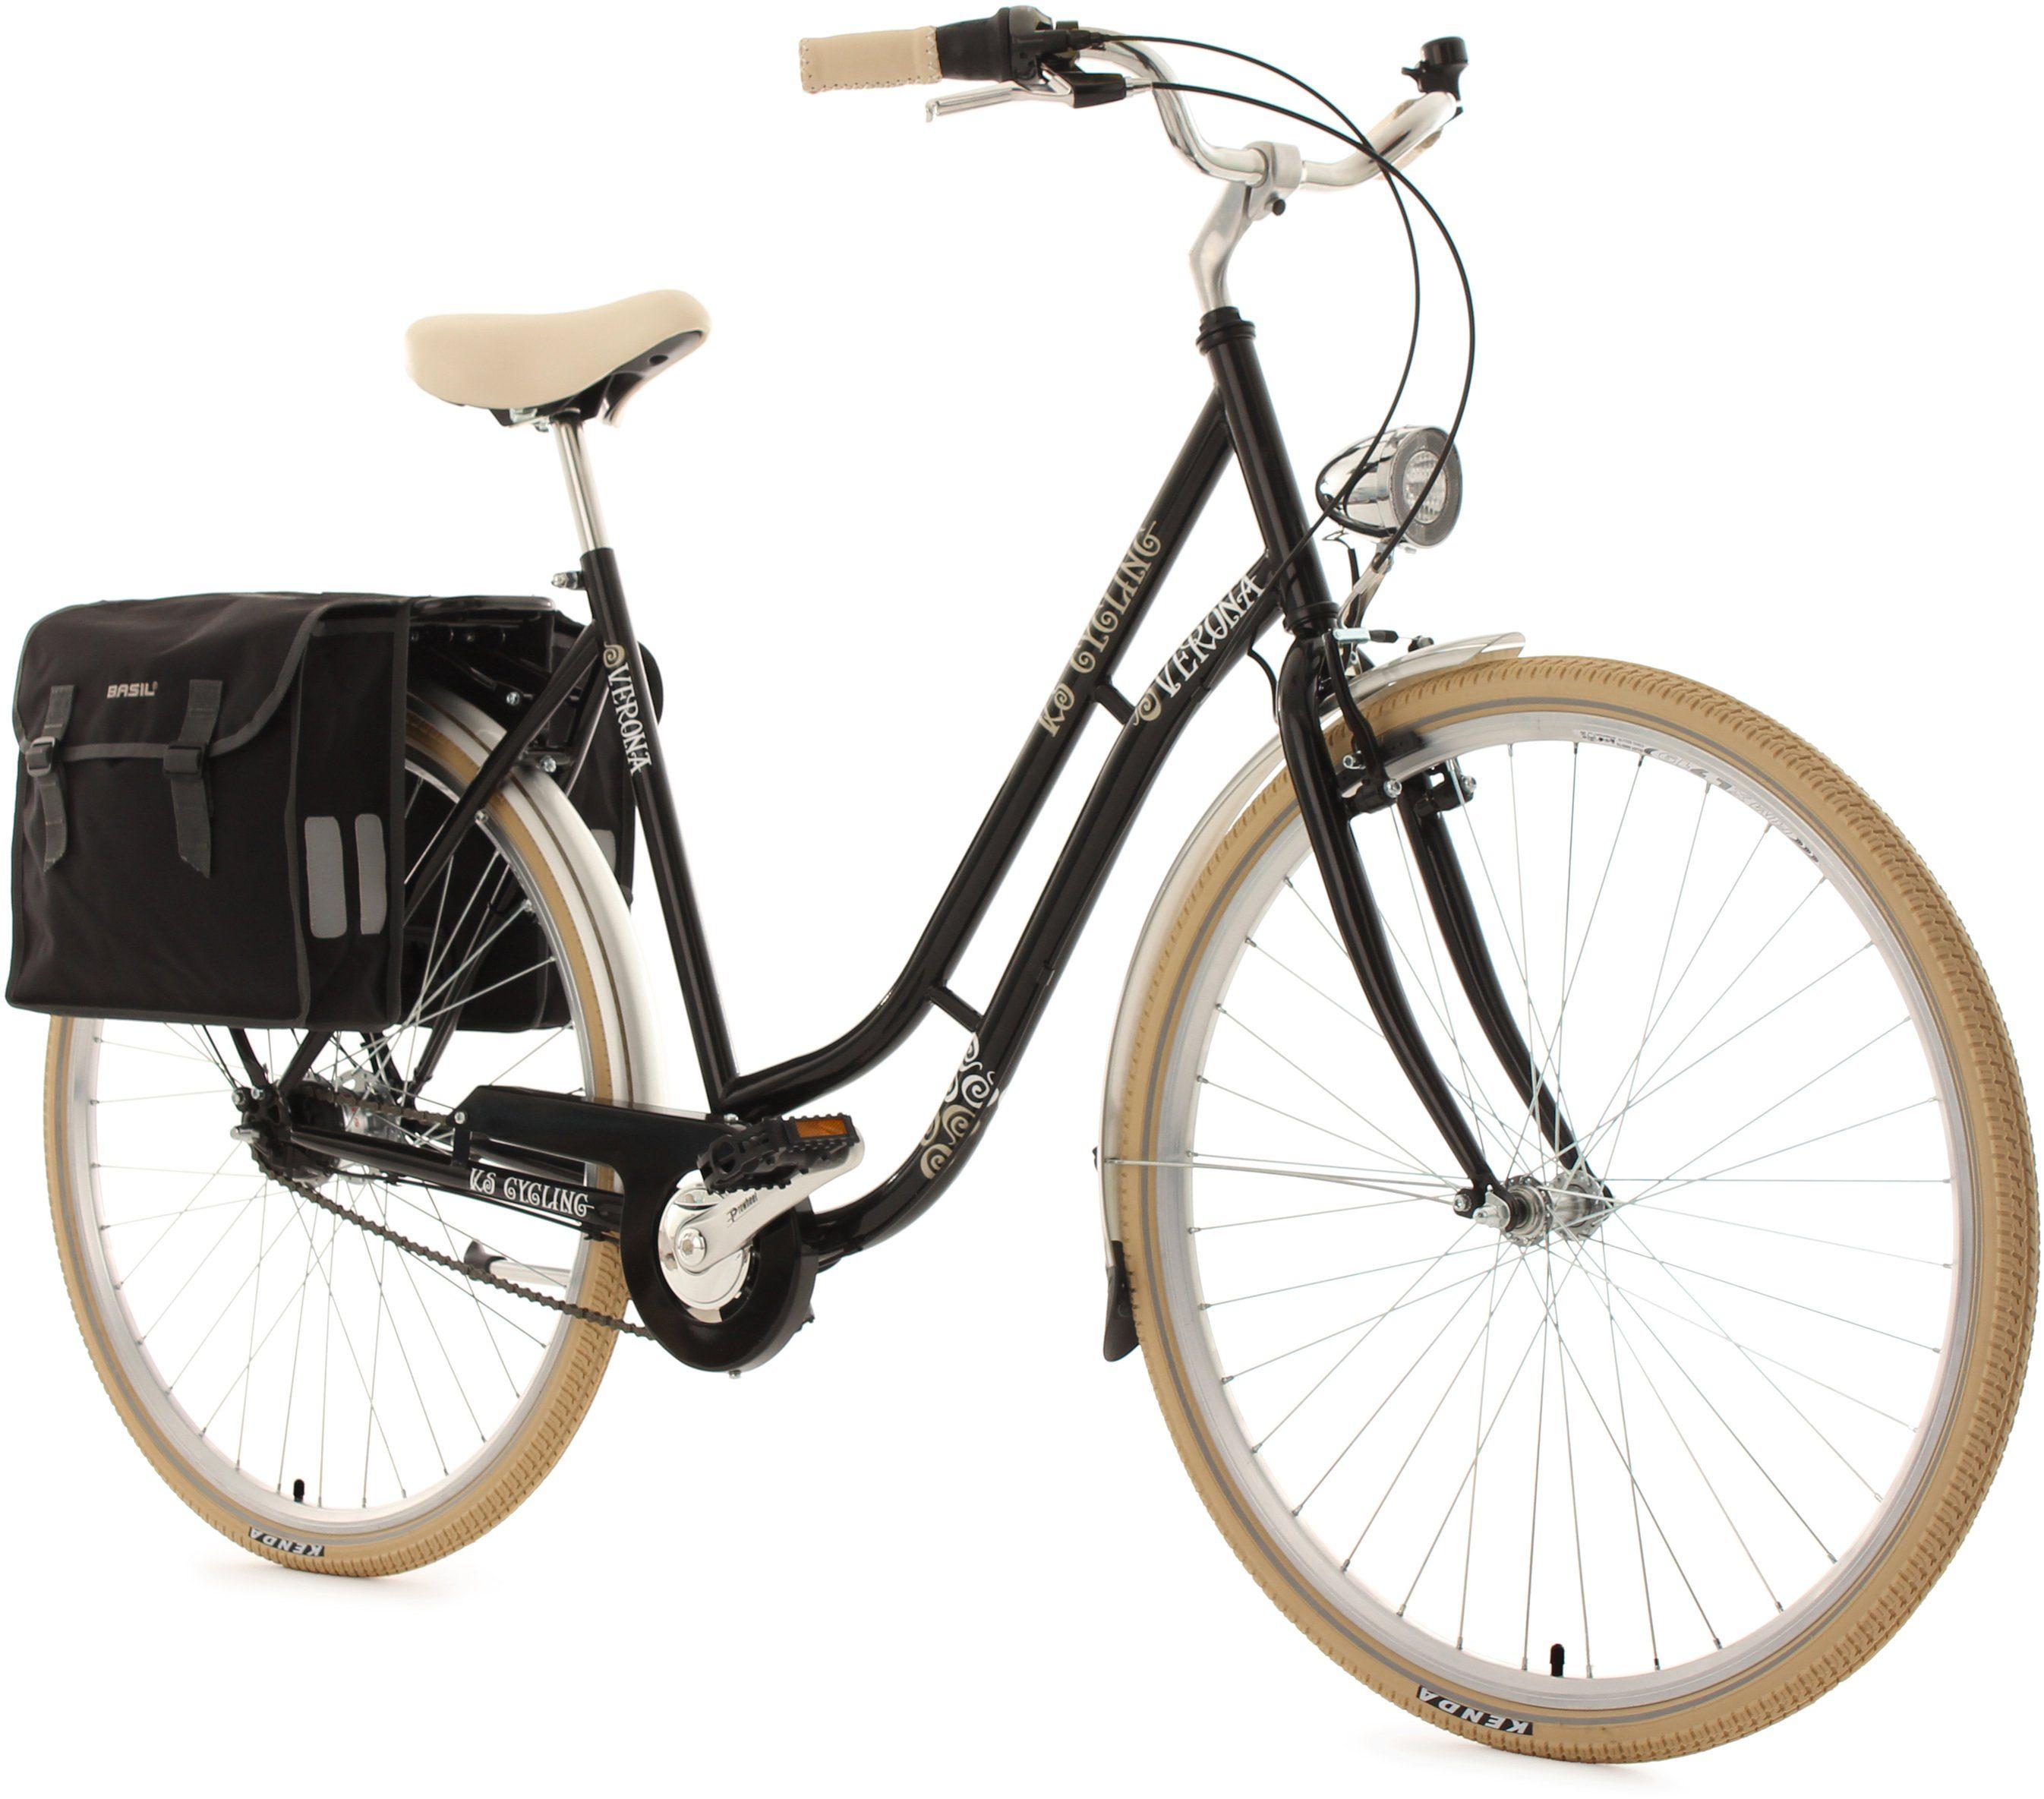 KS Cycling Damen-Cityrad, 28 Zoll, schwarz, 7 Gang Shimano Nexus, inkl. Doppelpacktasche, »Verona«